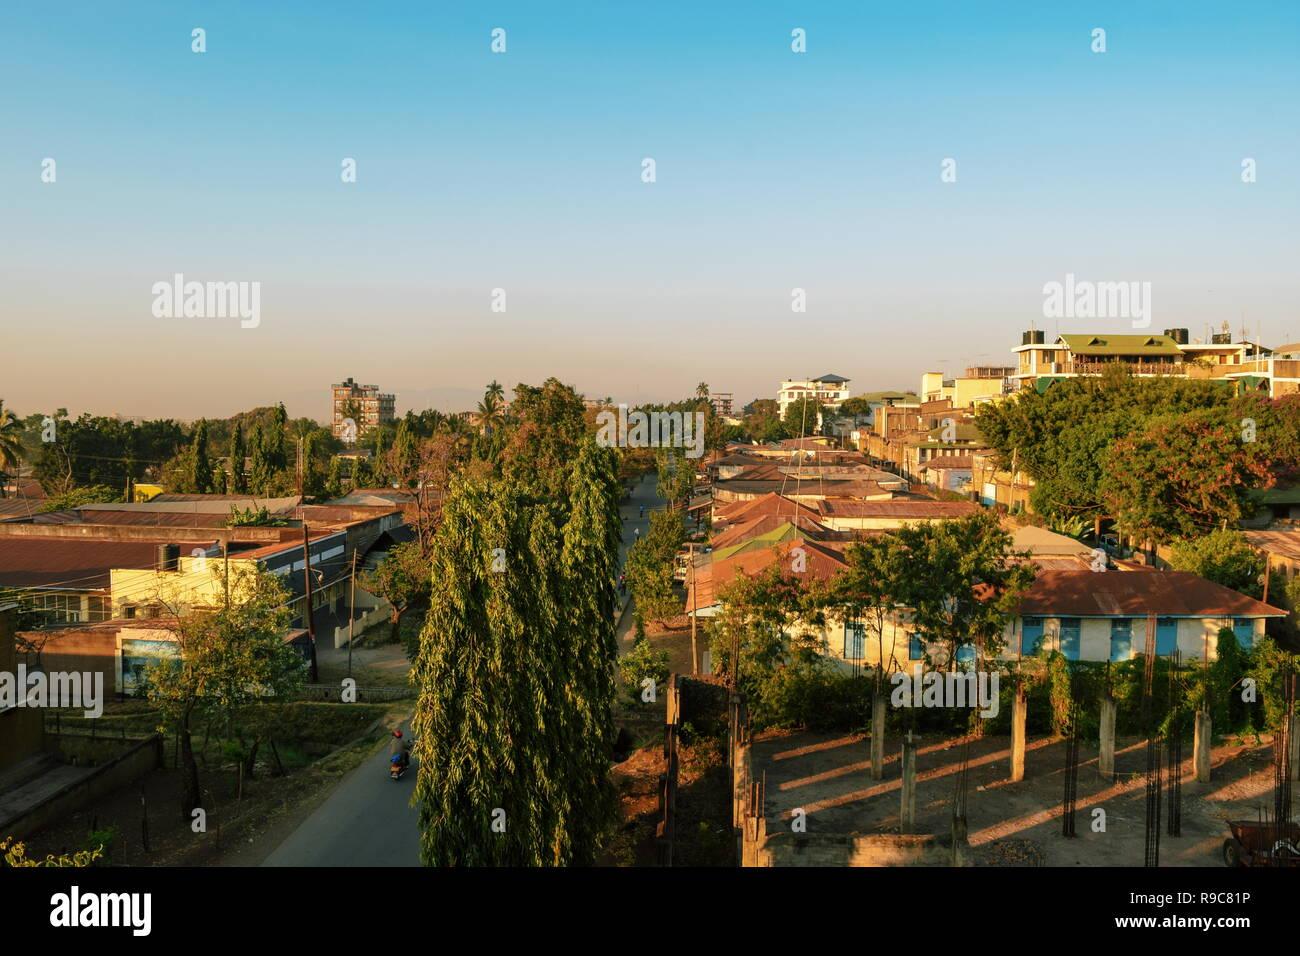 Moshi Town against the background of Mount Kilimanjaro, Tanzania - Stock Image